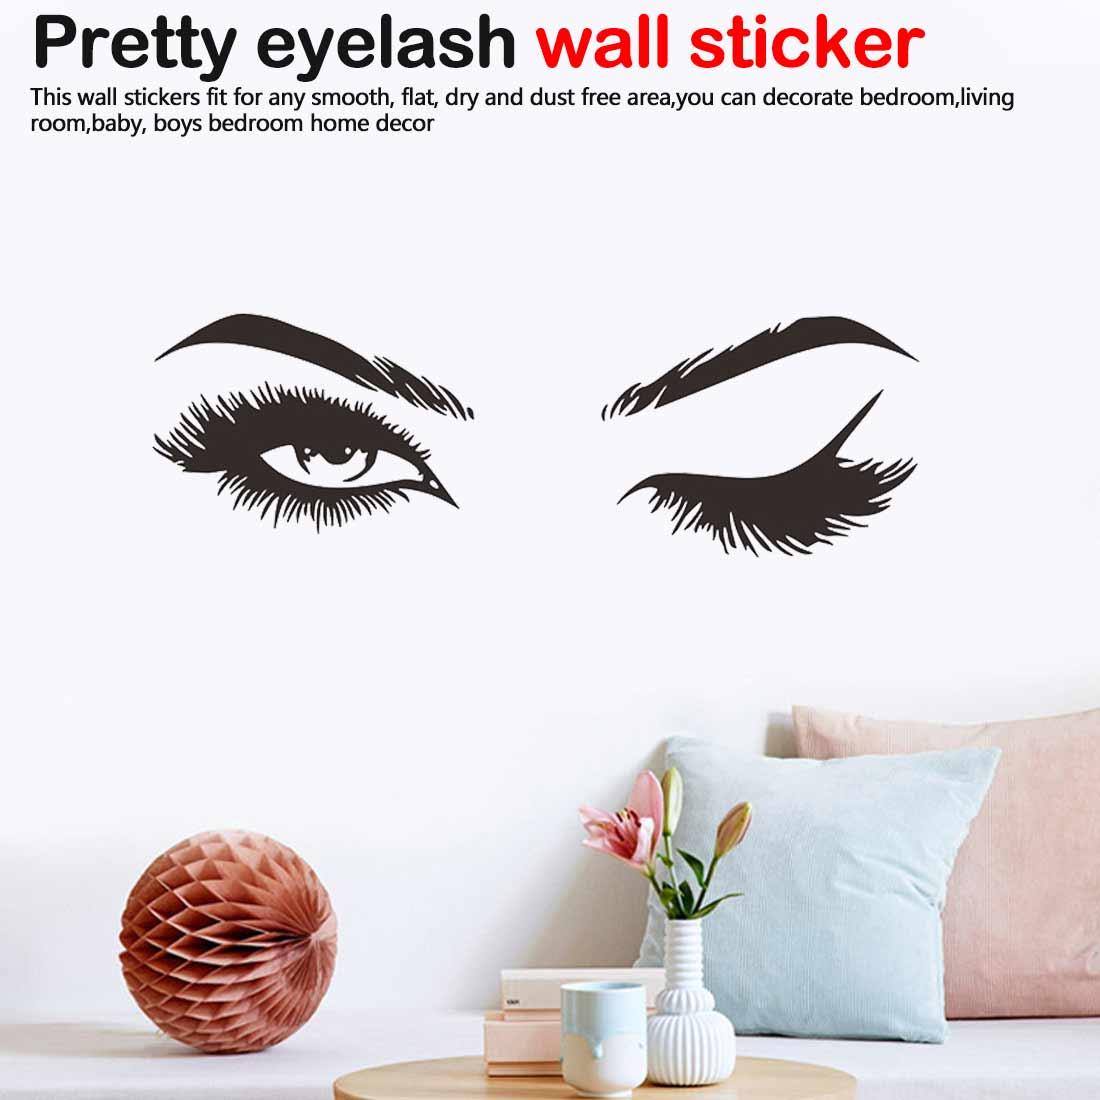 Beauty Salon Lady Big Eyes Lashes Wink Wall Sticker Art Mural Vinyl Decal Decor